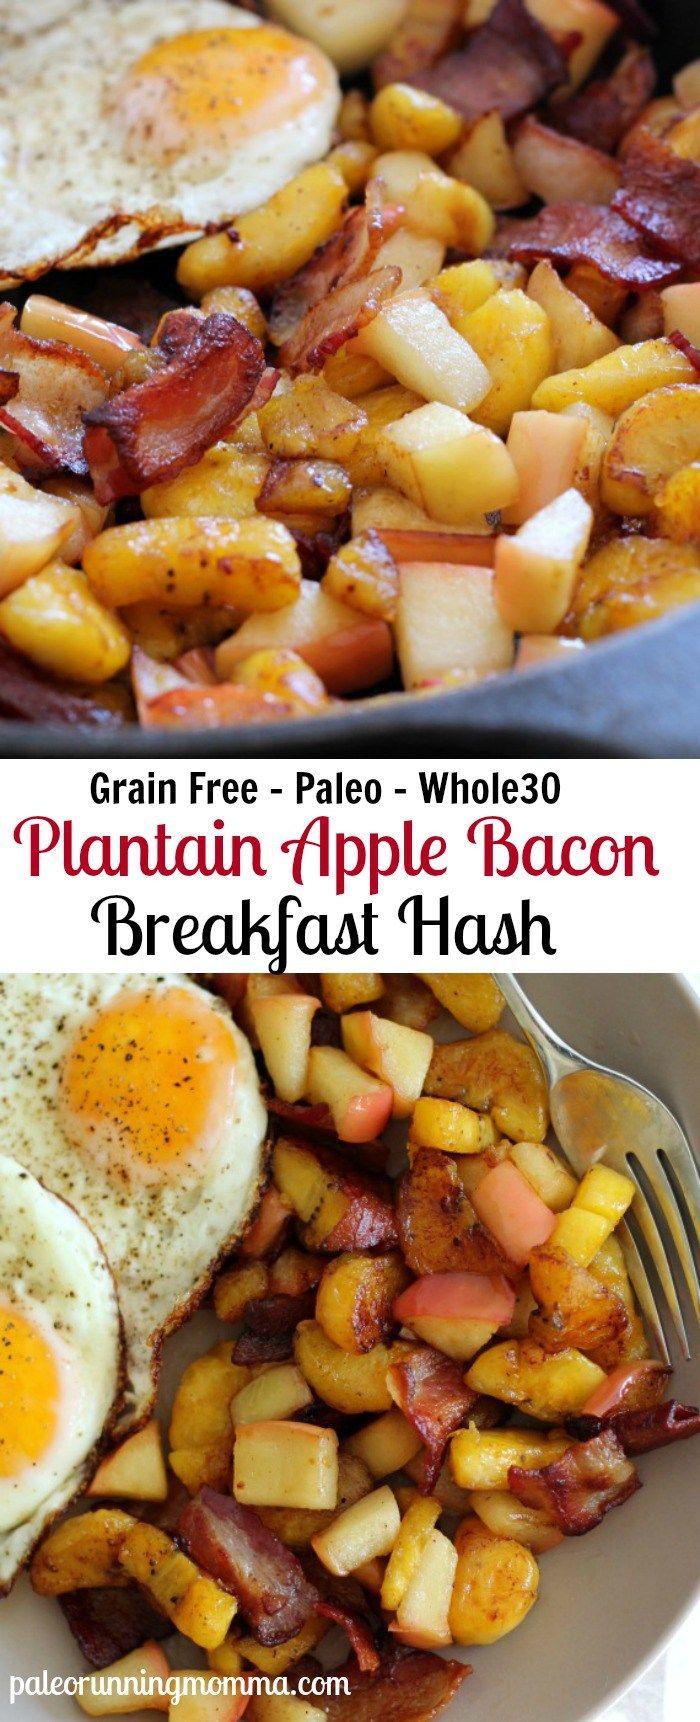 Sweet Plantain Apple Bacon Breakfast hash - With fried Eggs - #paleo #grainfree #glutenfree #whole30 #dairyfree